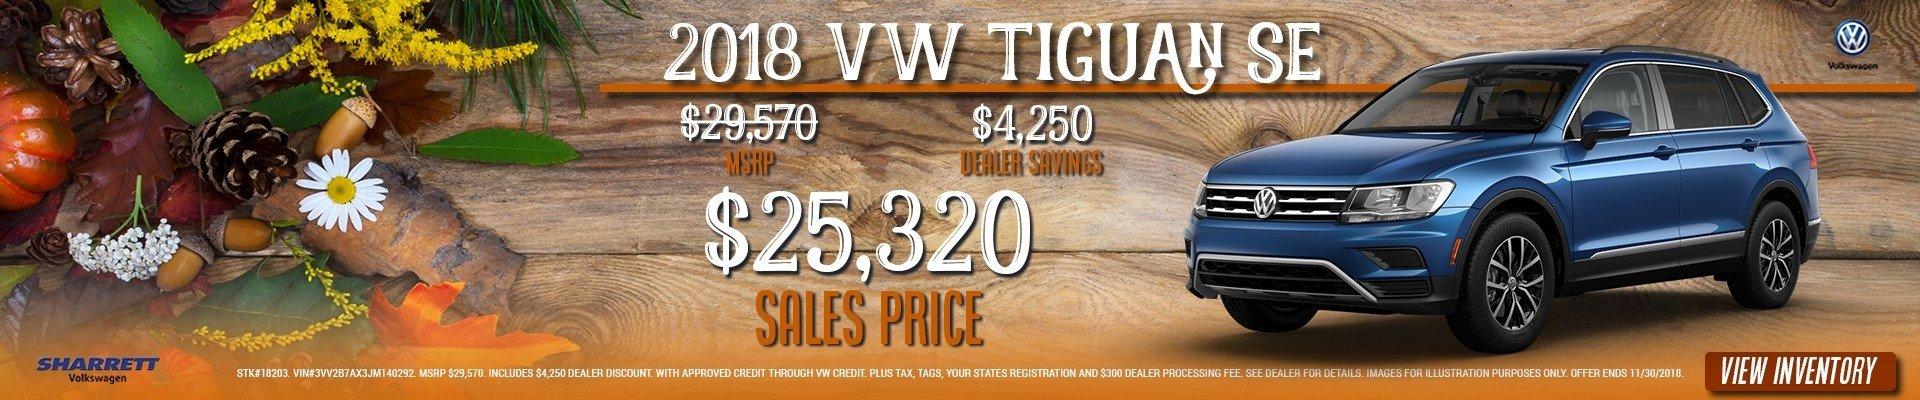 Get a new 2018 VW Tiguan for $25,320 –SAVE $4,250 at Sharrett Volkswagen